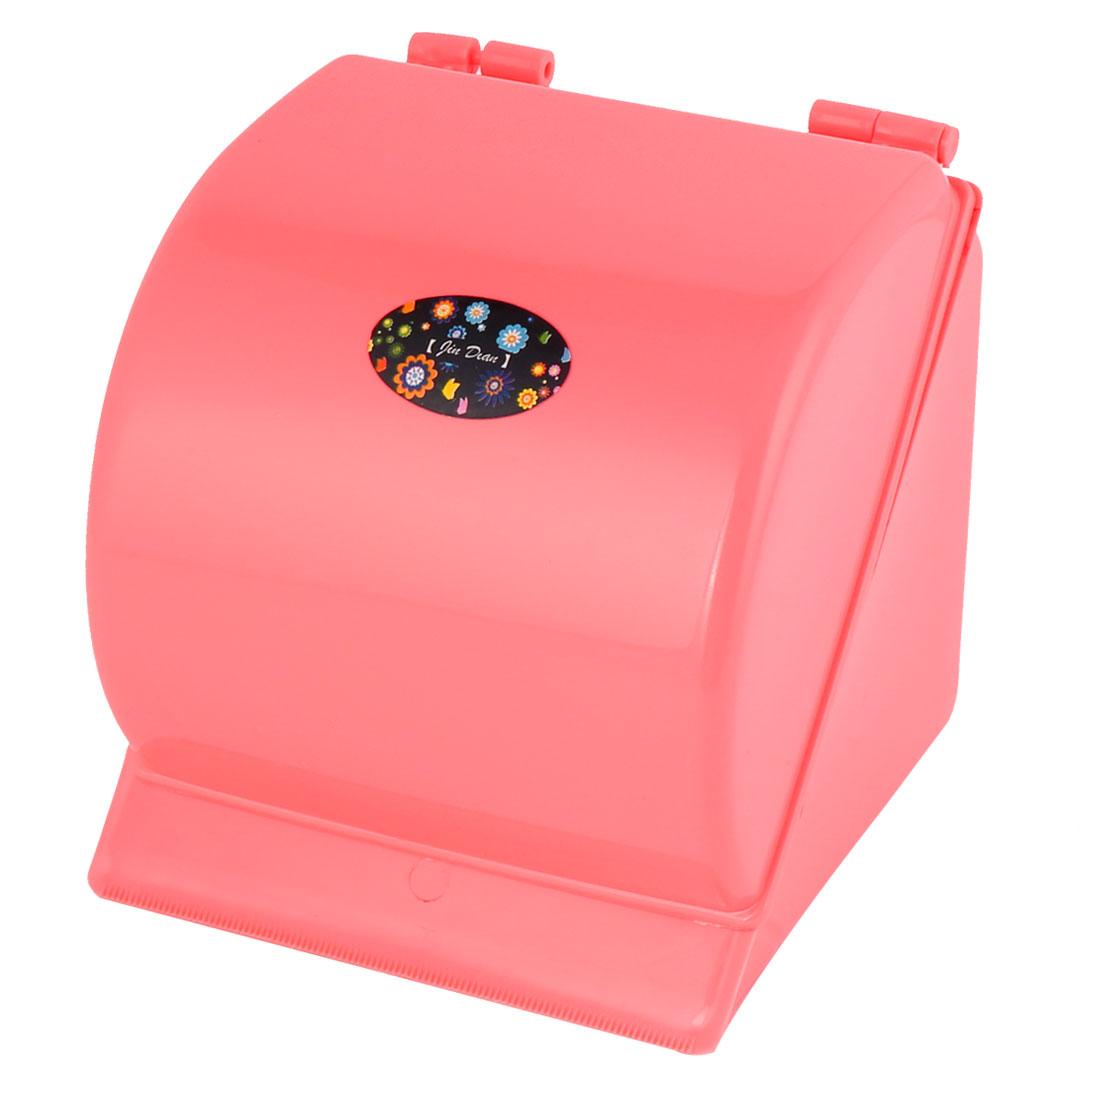 Bathroom Plastic Sticky Toilet Roll Paper Tissue Hanger Holder Rack Coral Pink